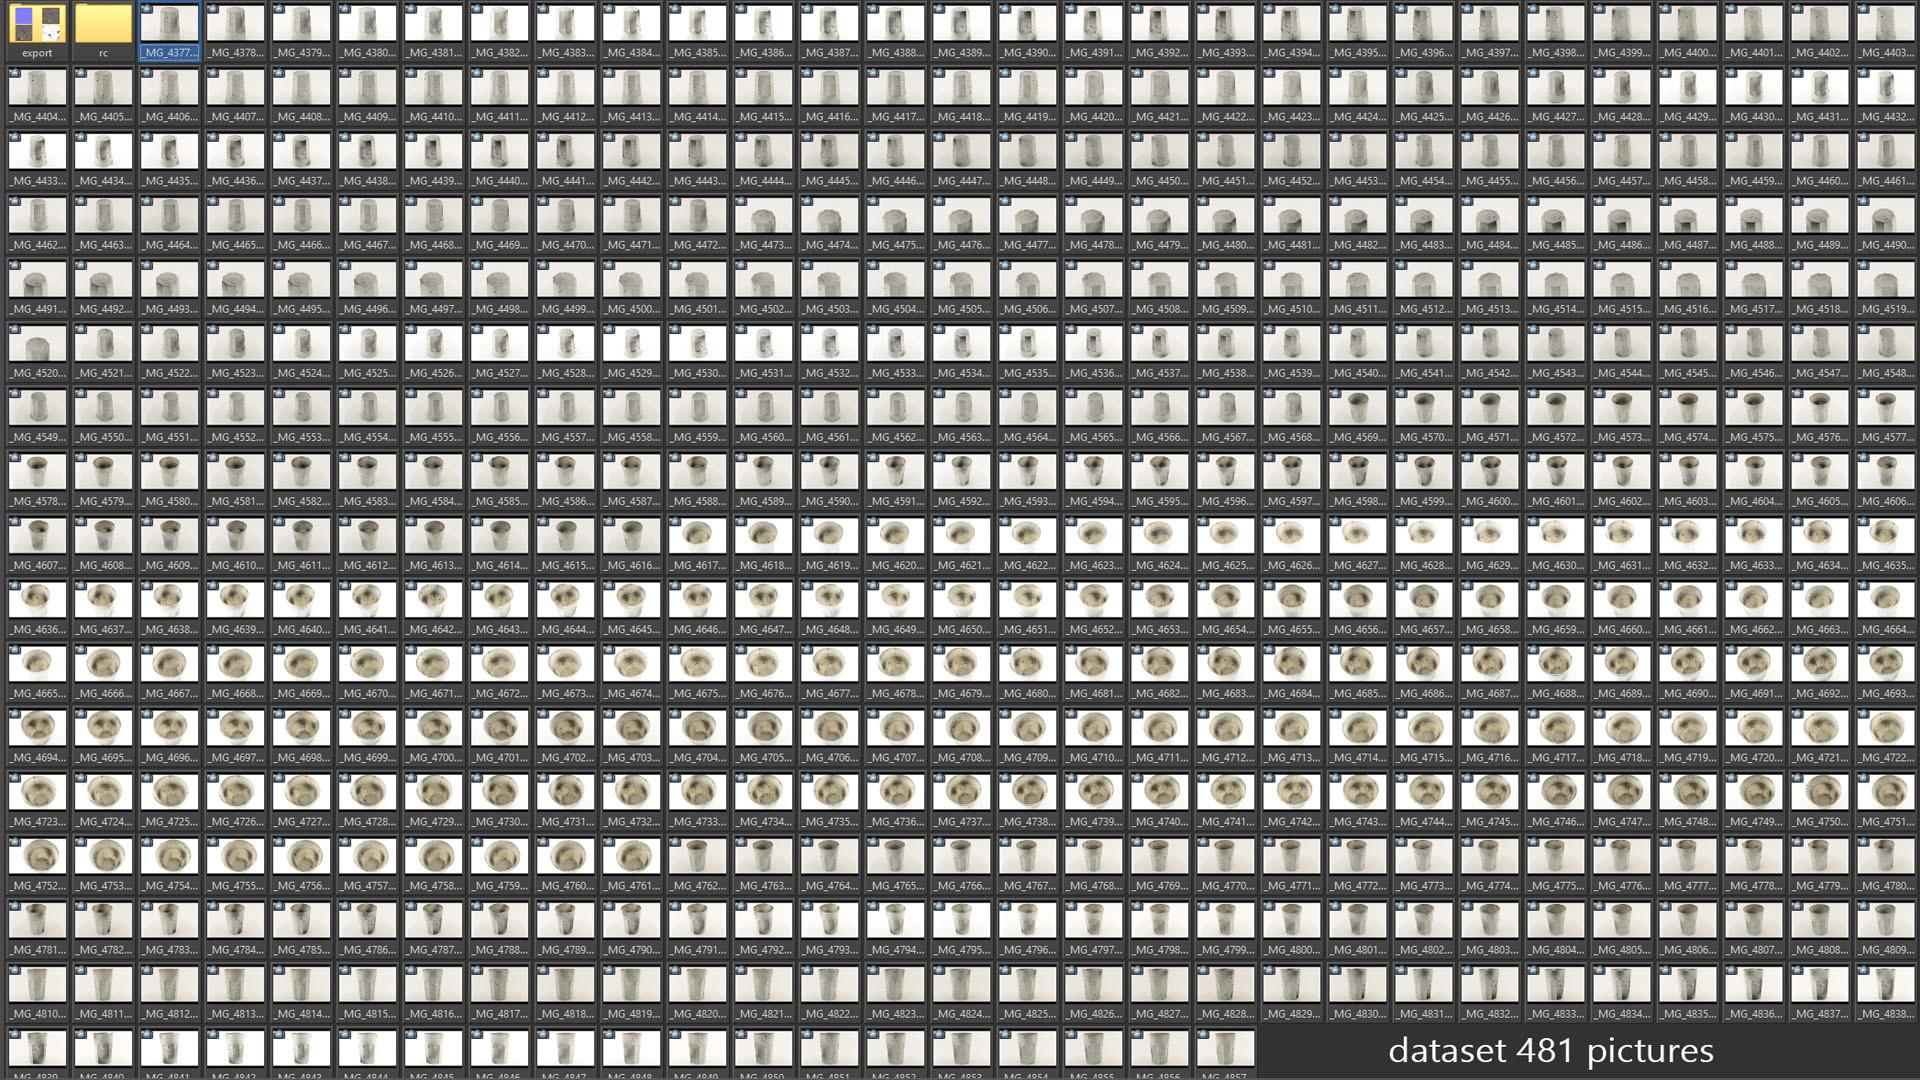 image dataset - Canon D70 + EF-ss 17-55mm f/2,8 IS USM